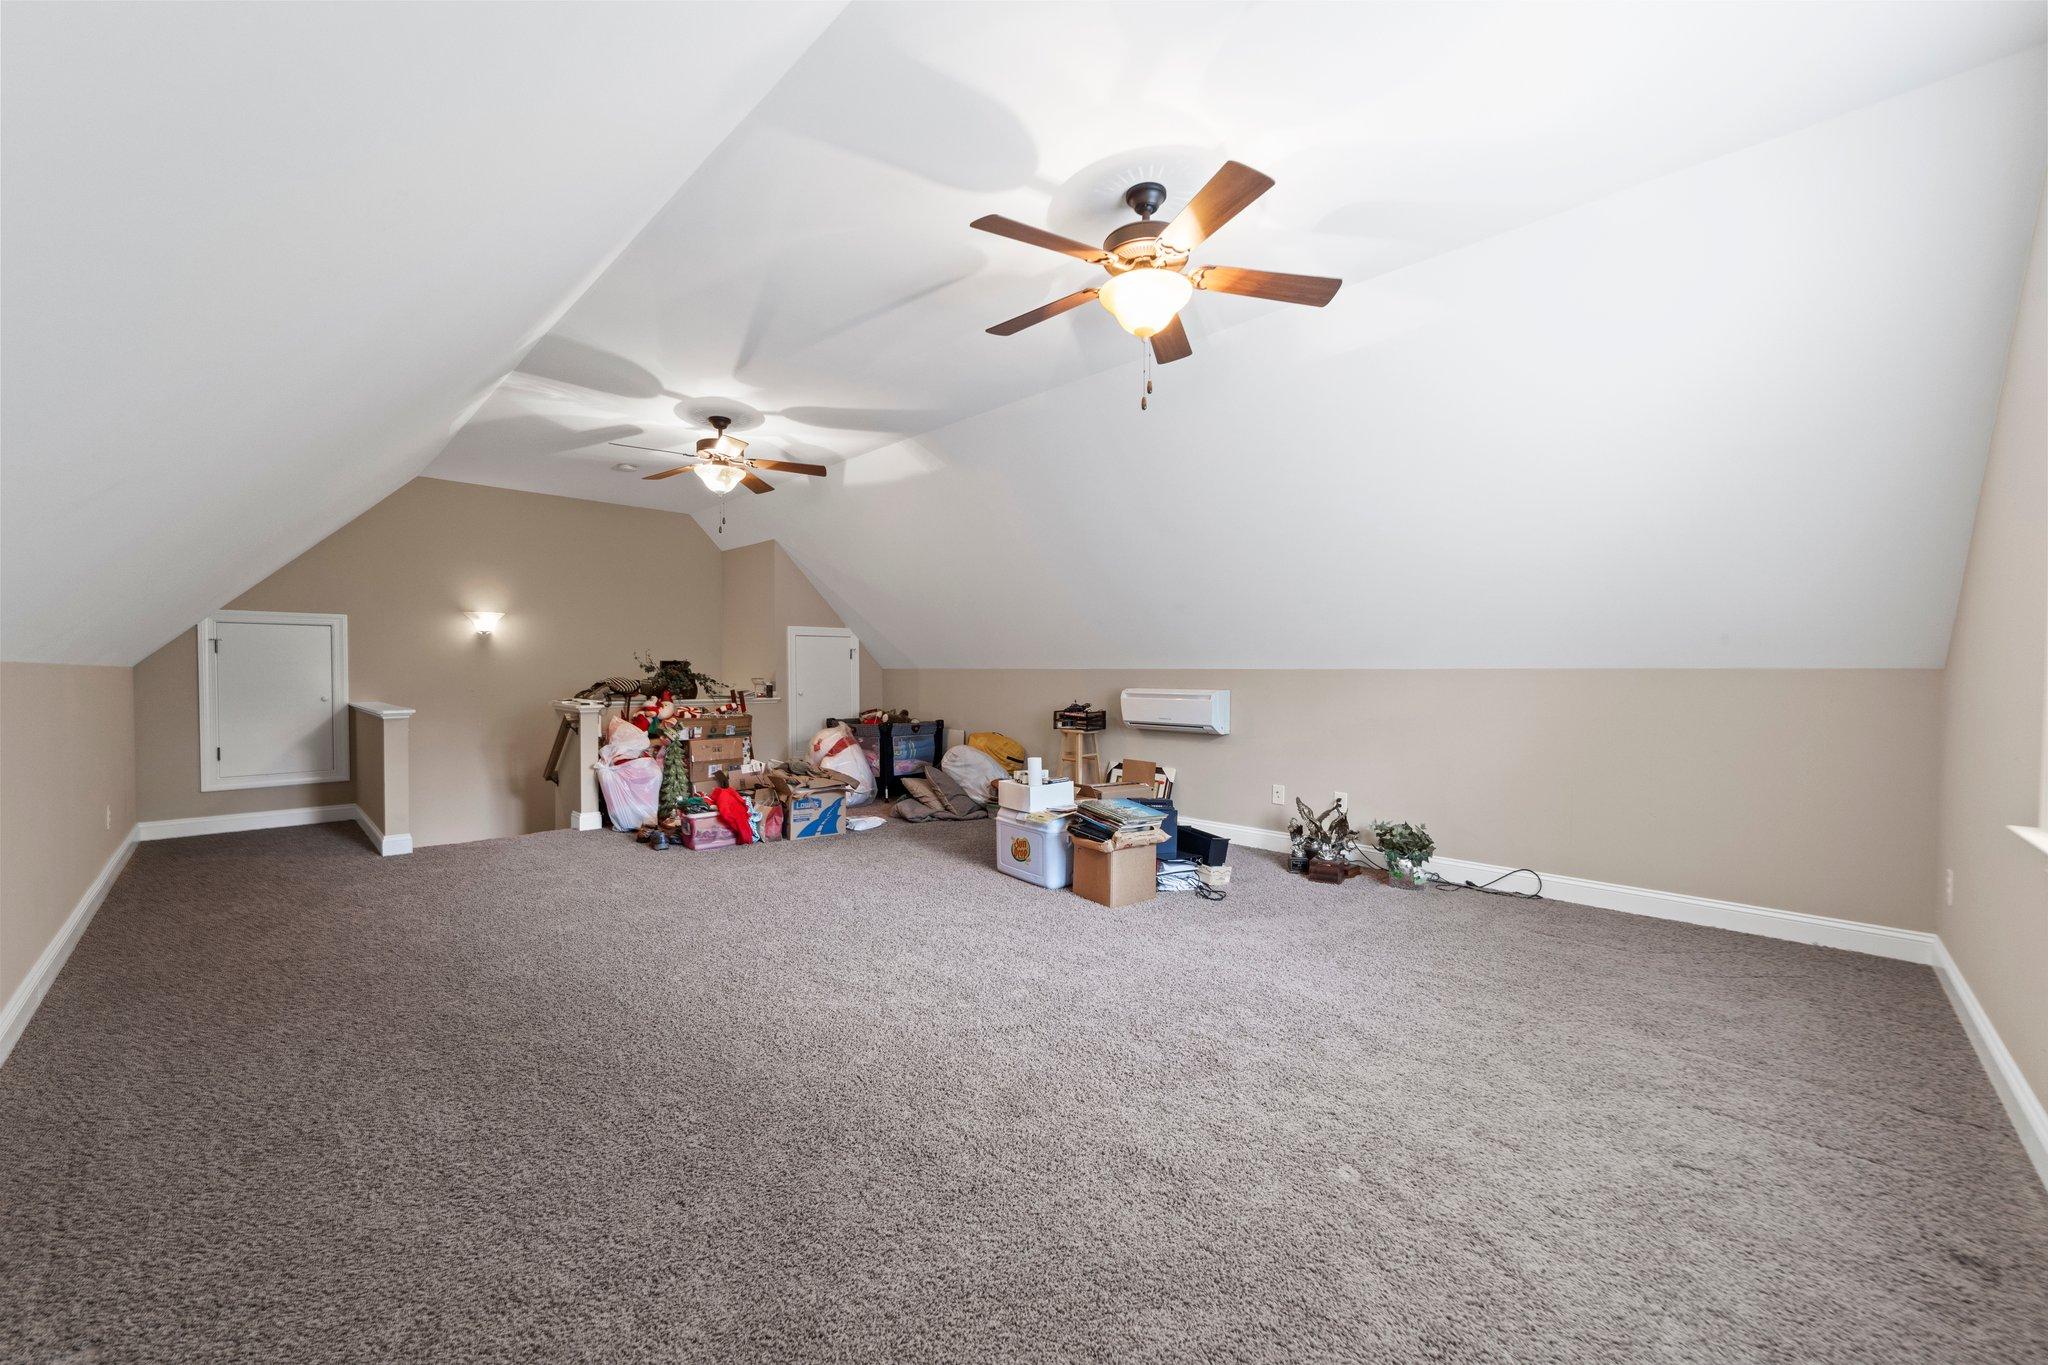 324 Saffron Ct, Sanford, NC 27330, USA Photo 24